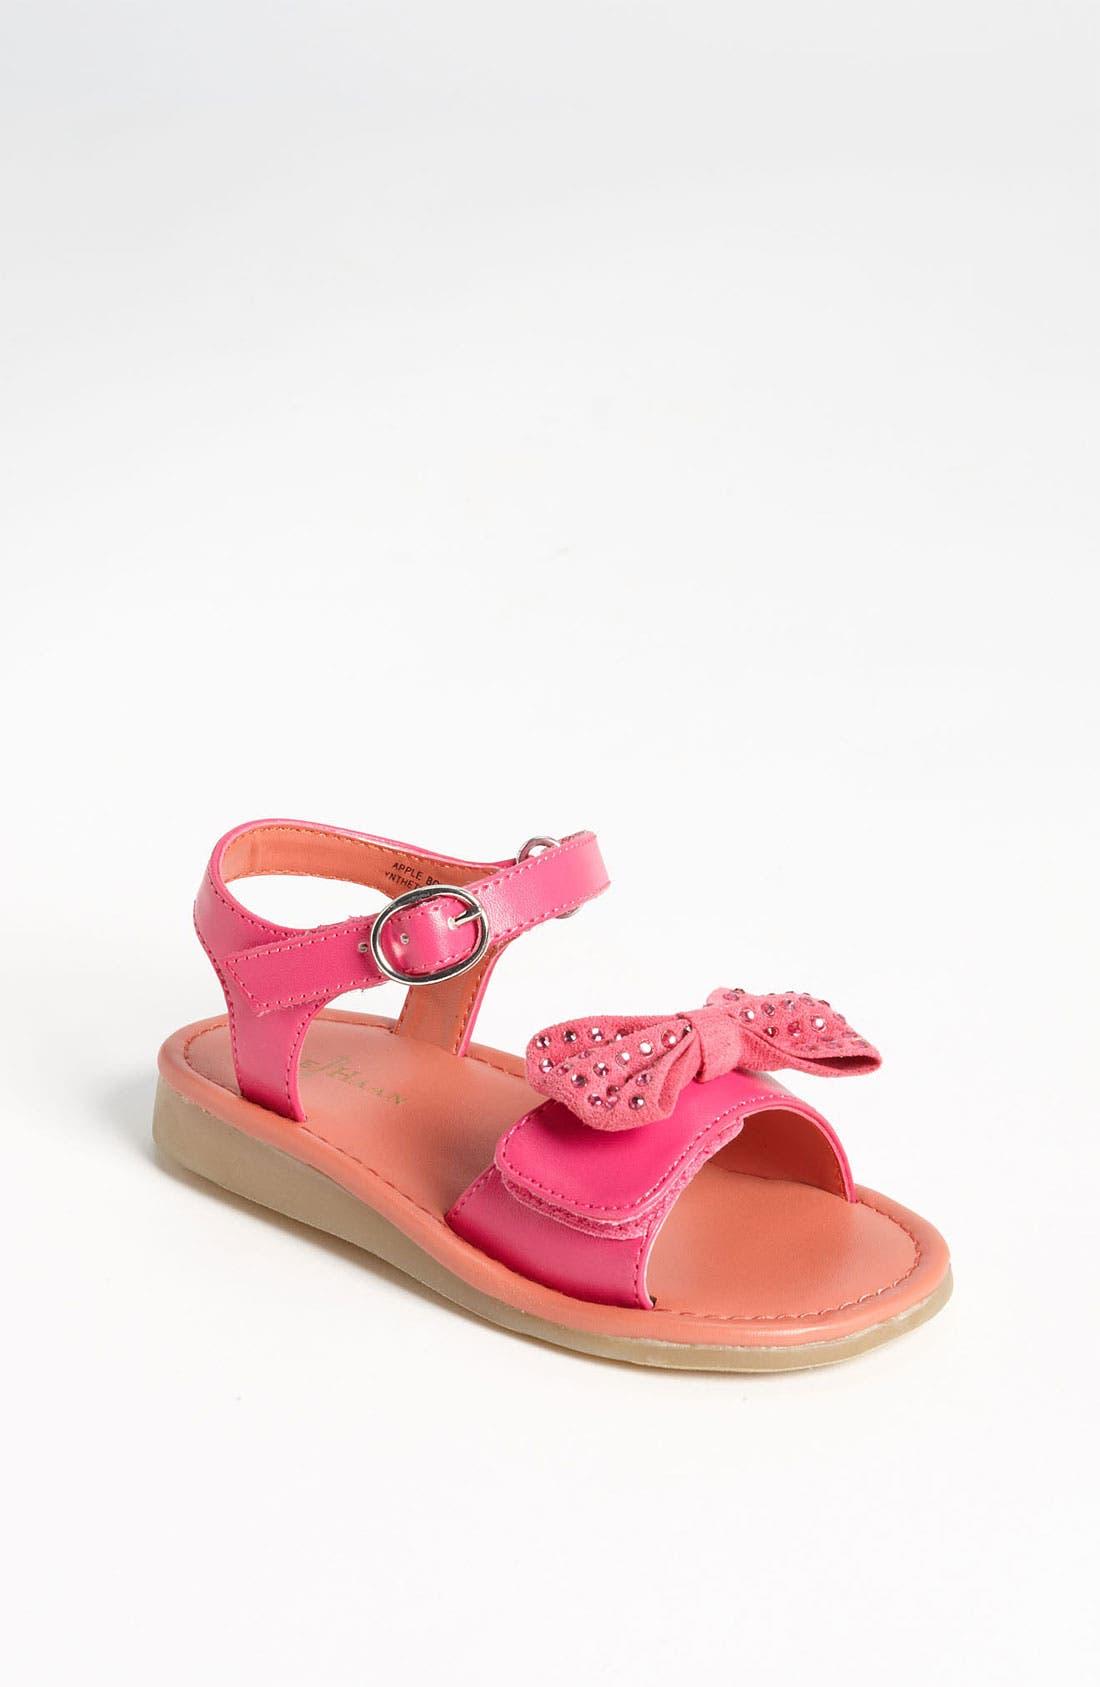 Main Image - Cole Haan 'Apple Bow' Sandal (Walker & Toddler)